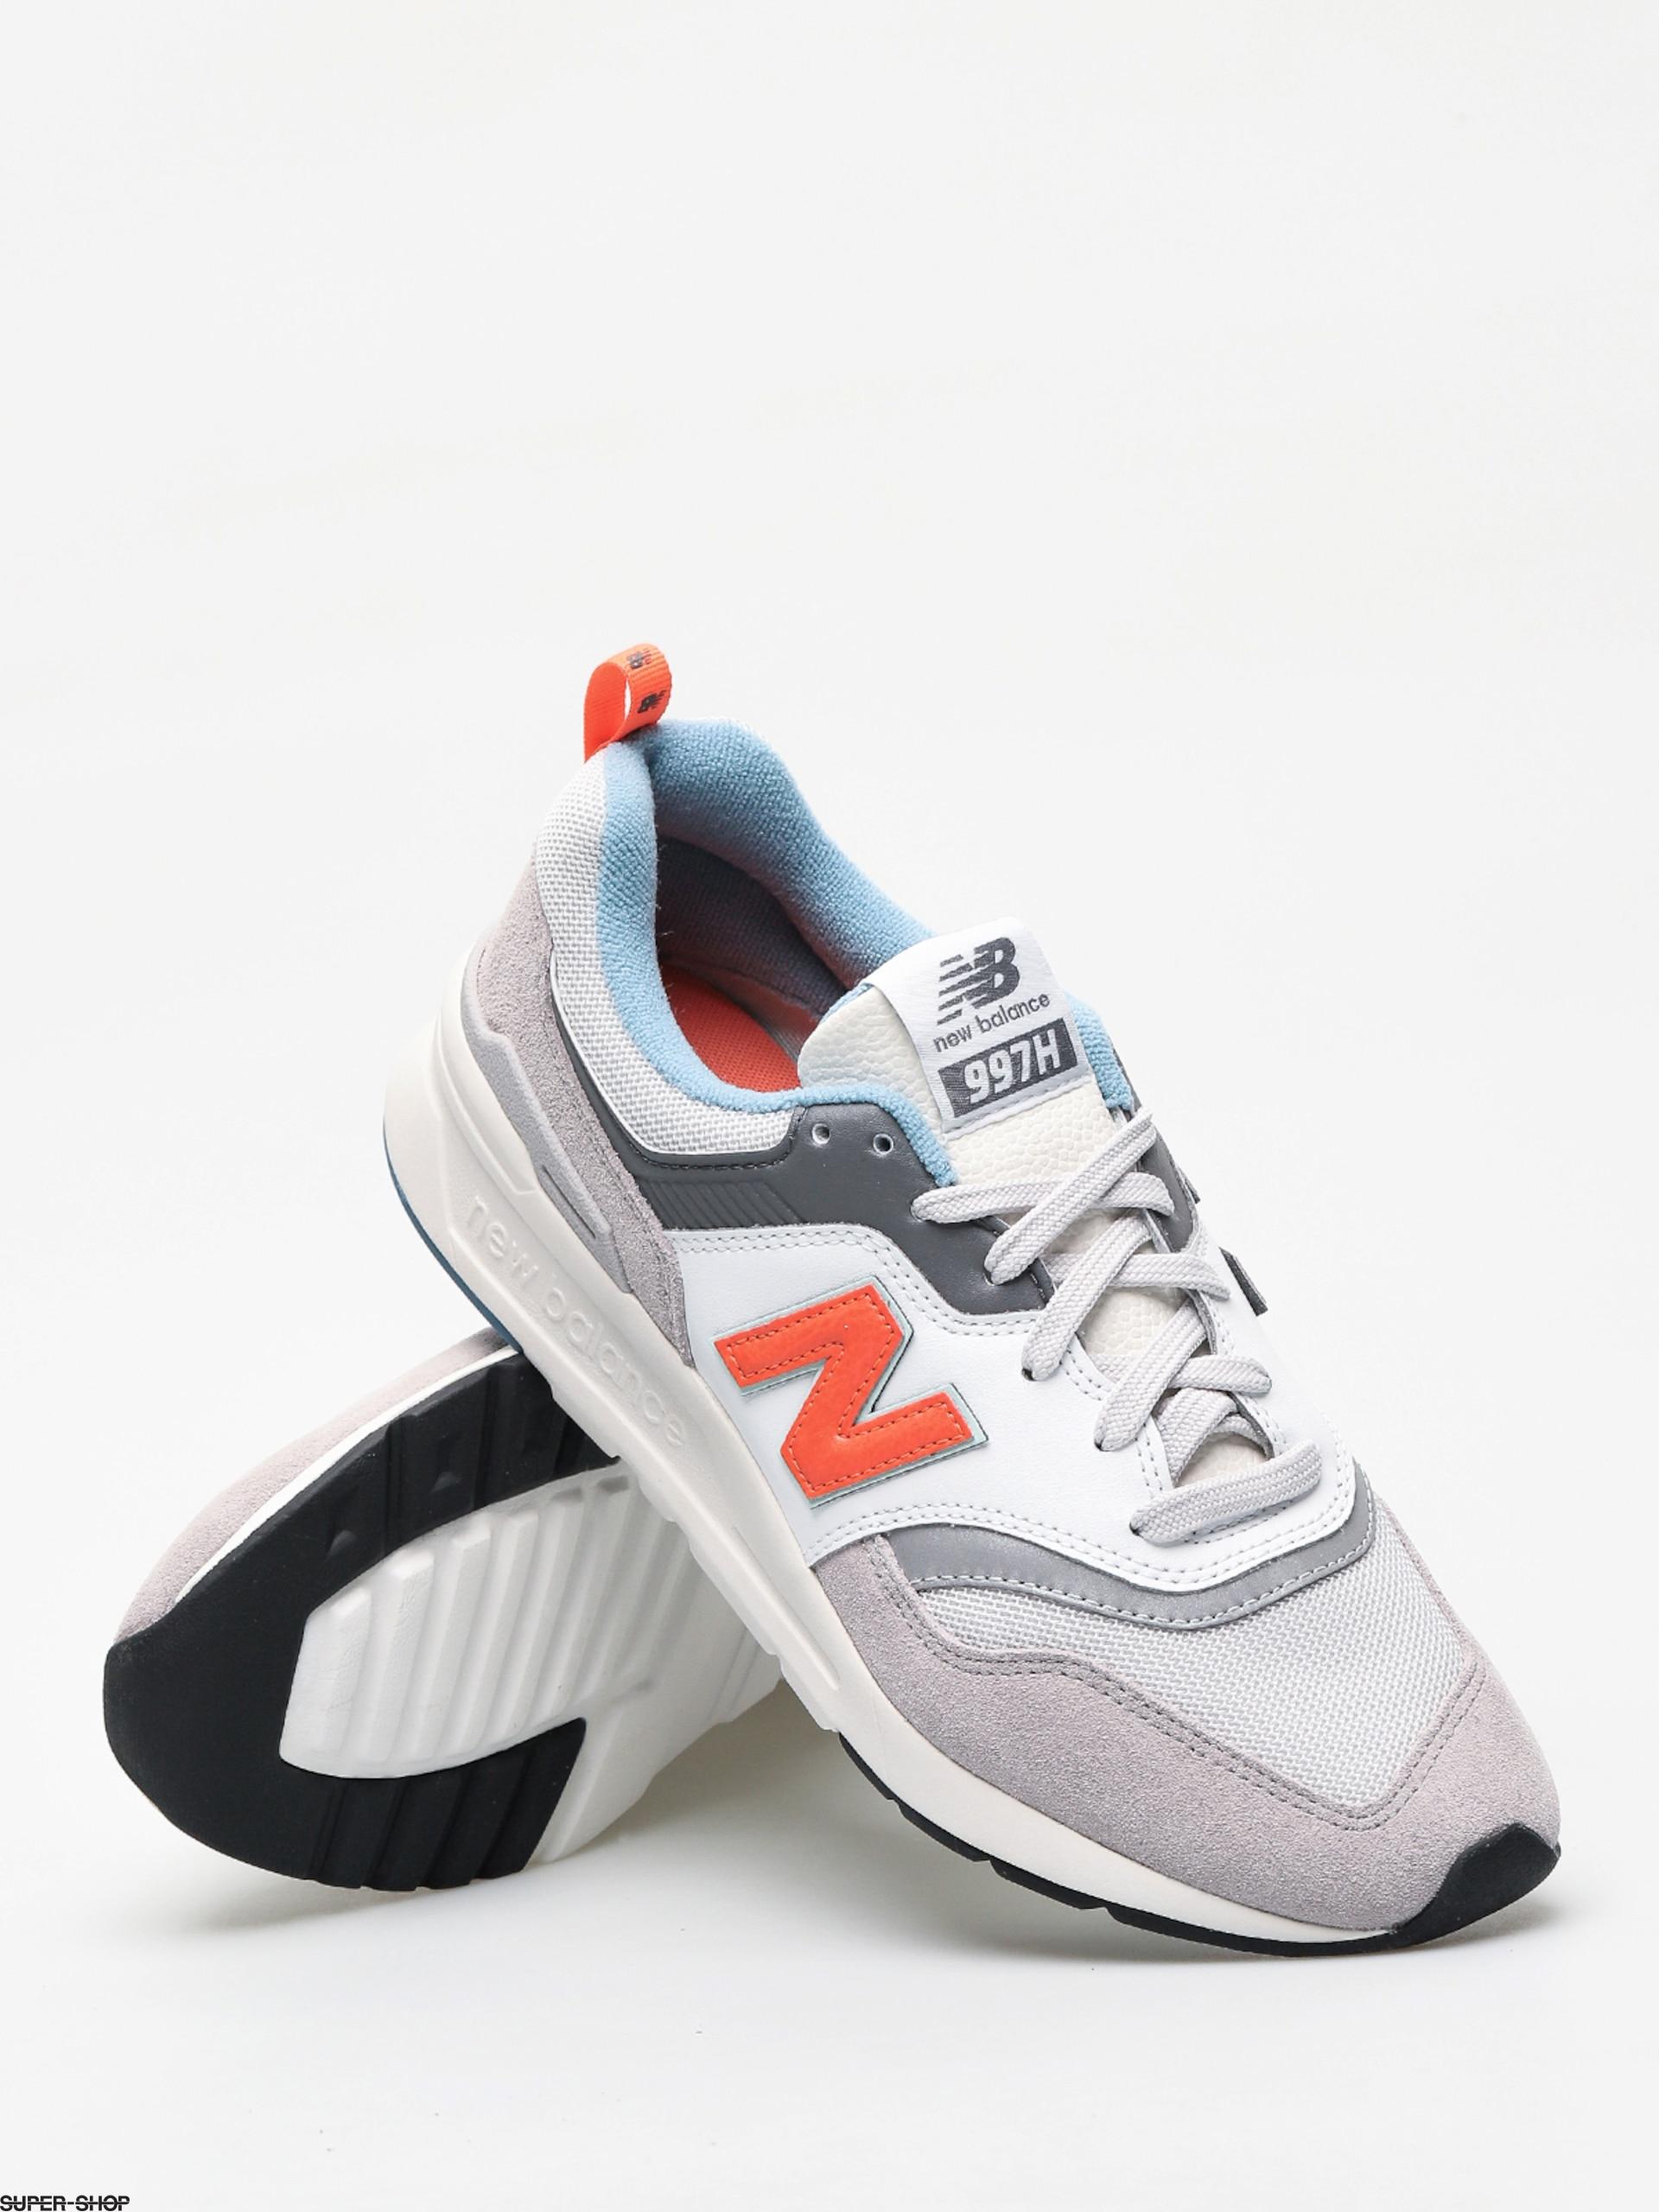 New Balance 997 Shoes (rain cloud)